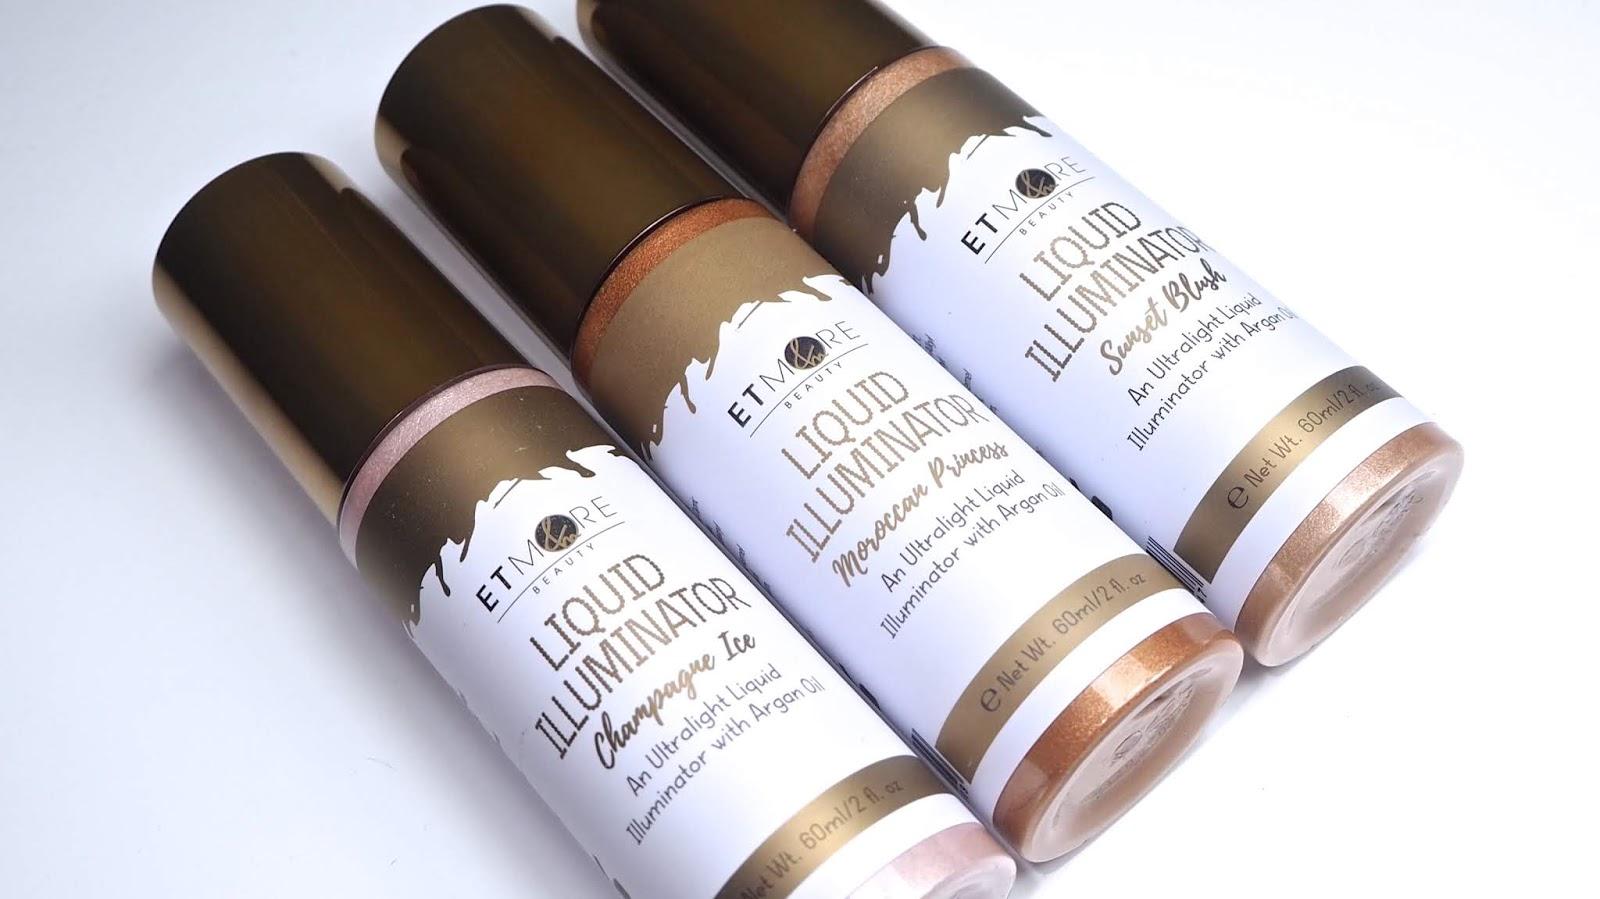 Etmore Beauty Liquid Illuminators